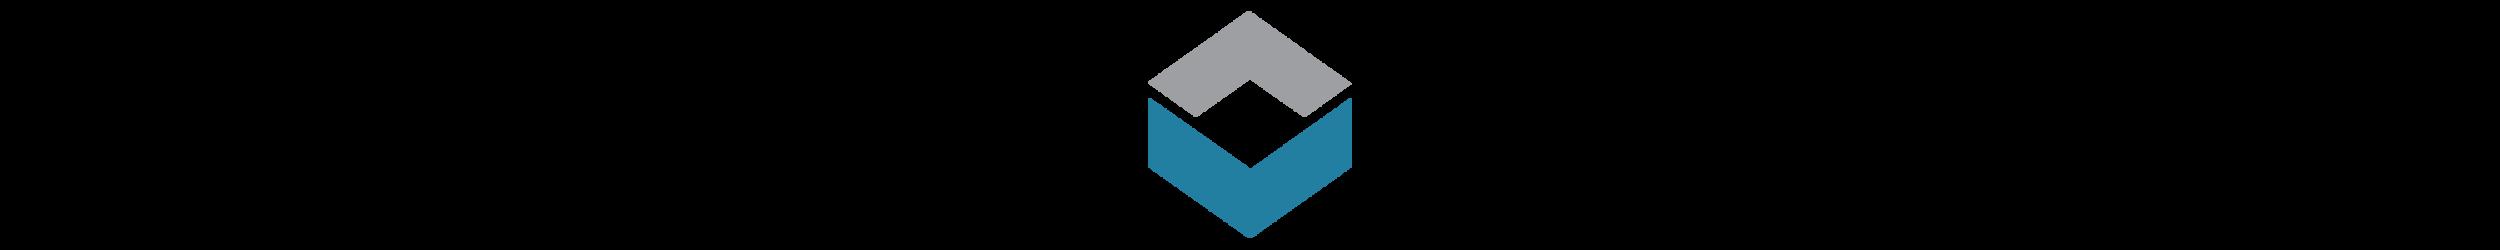 Logo Icon 1.png